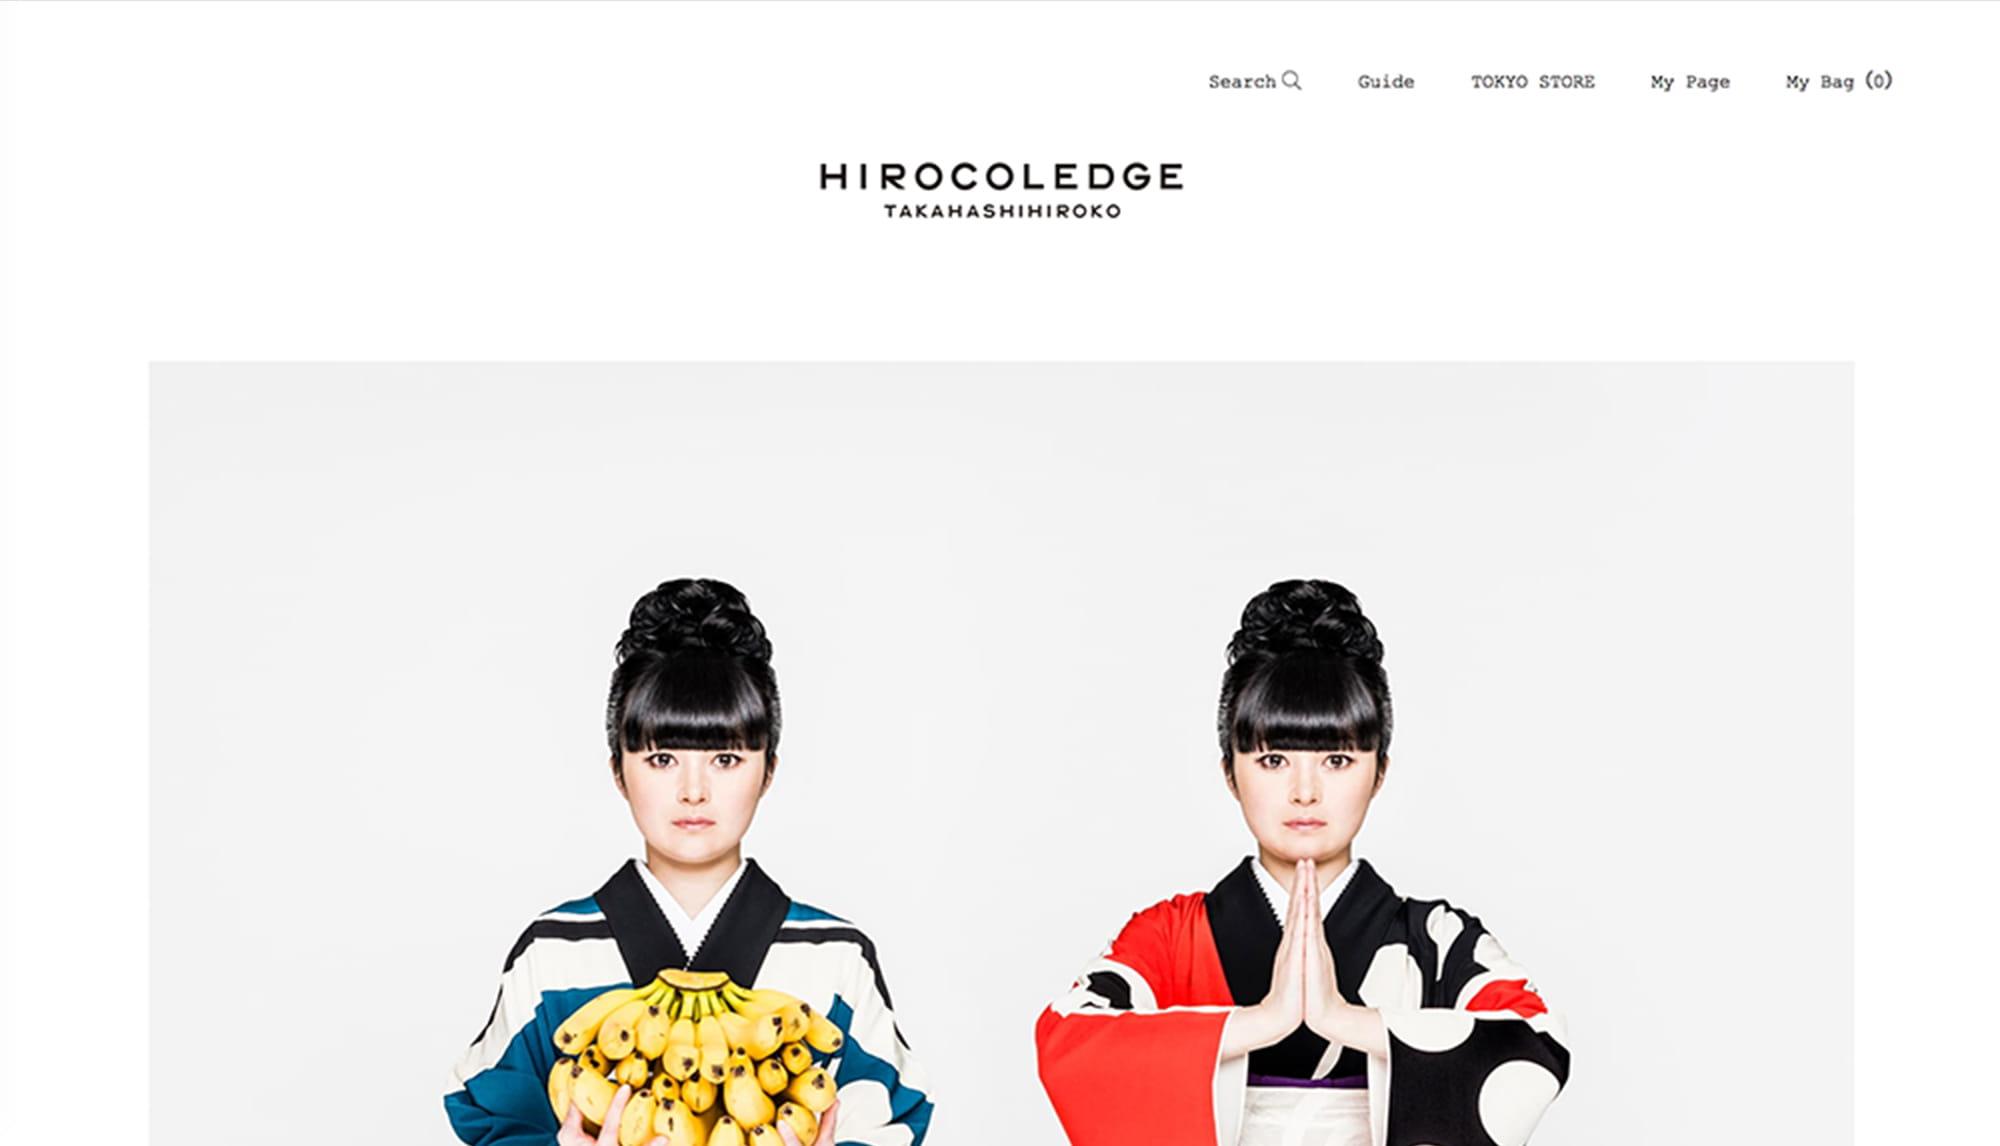 TAKAHASHI HIROKO / HIROKOLEDGE